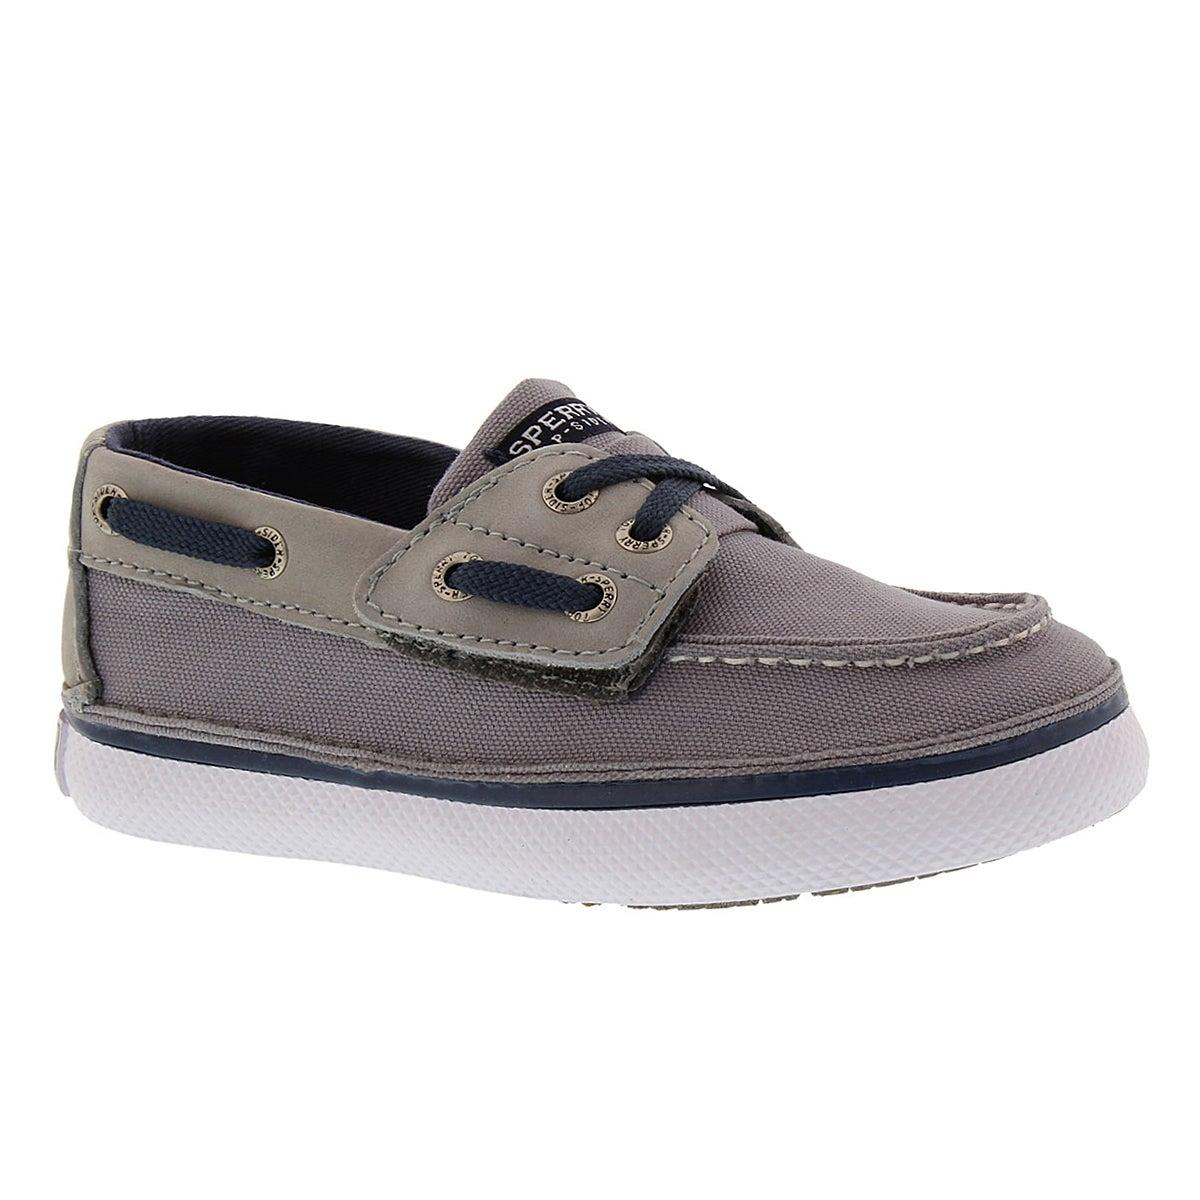 Chaussure bateau gris/mari CRUZ JR., béb